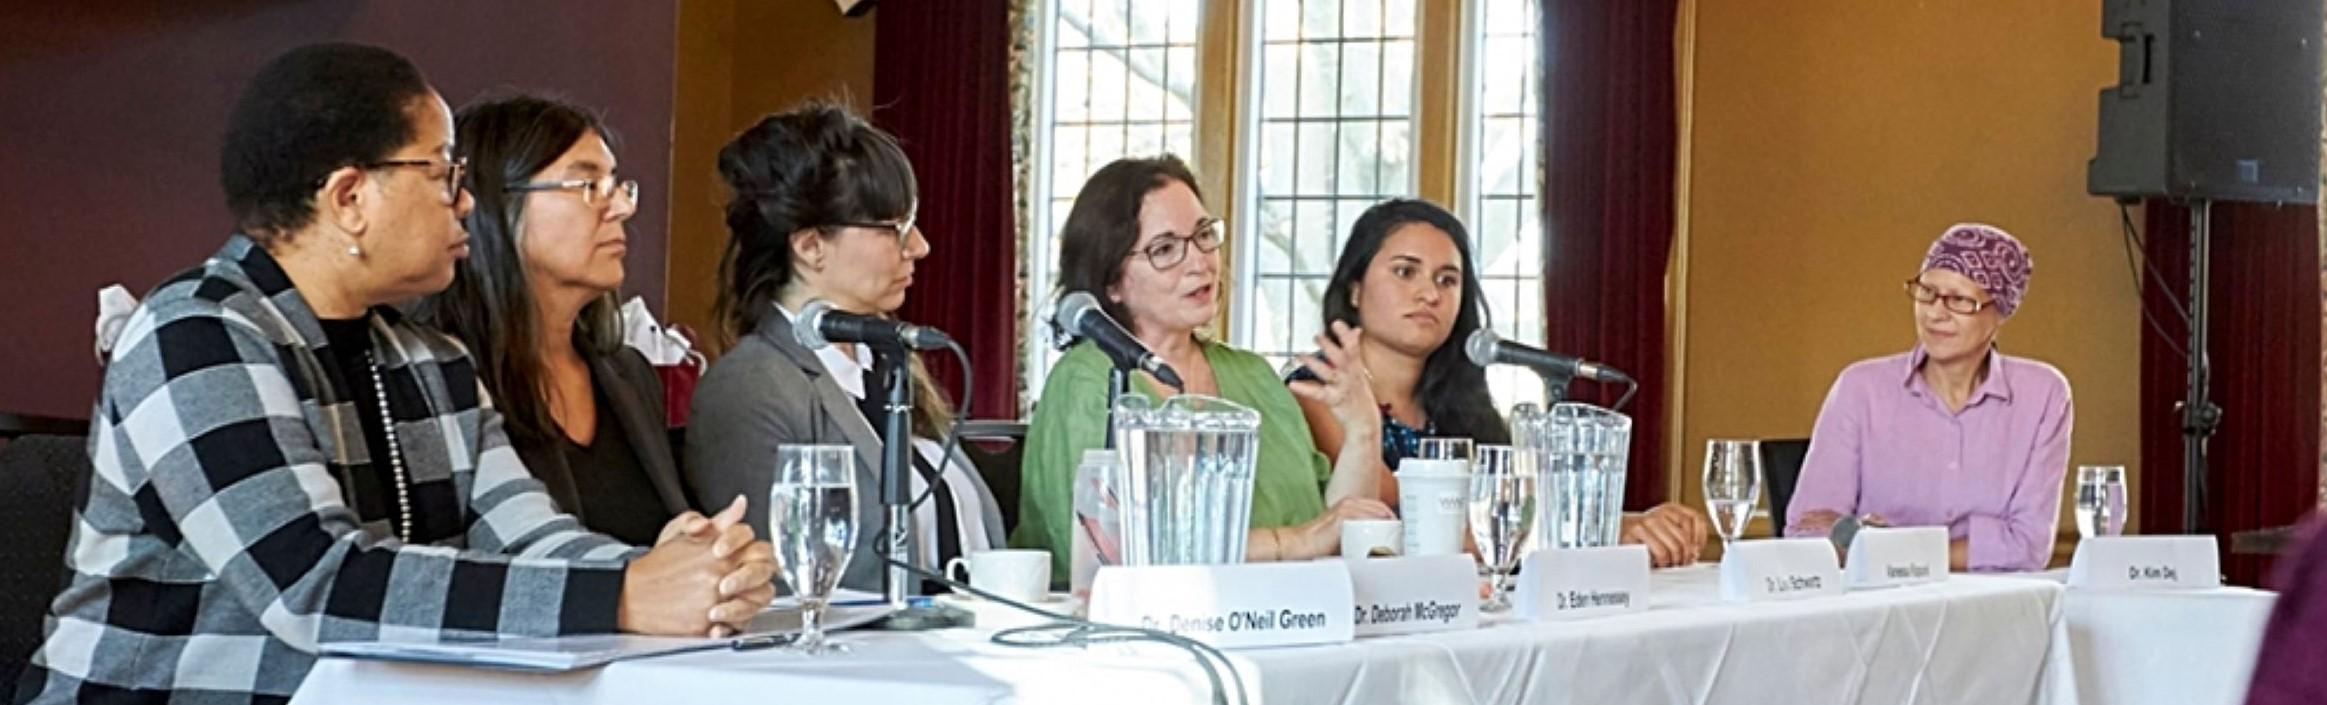 BANNER Research Lisa Schwartz Women-in-STEM-panel (3)